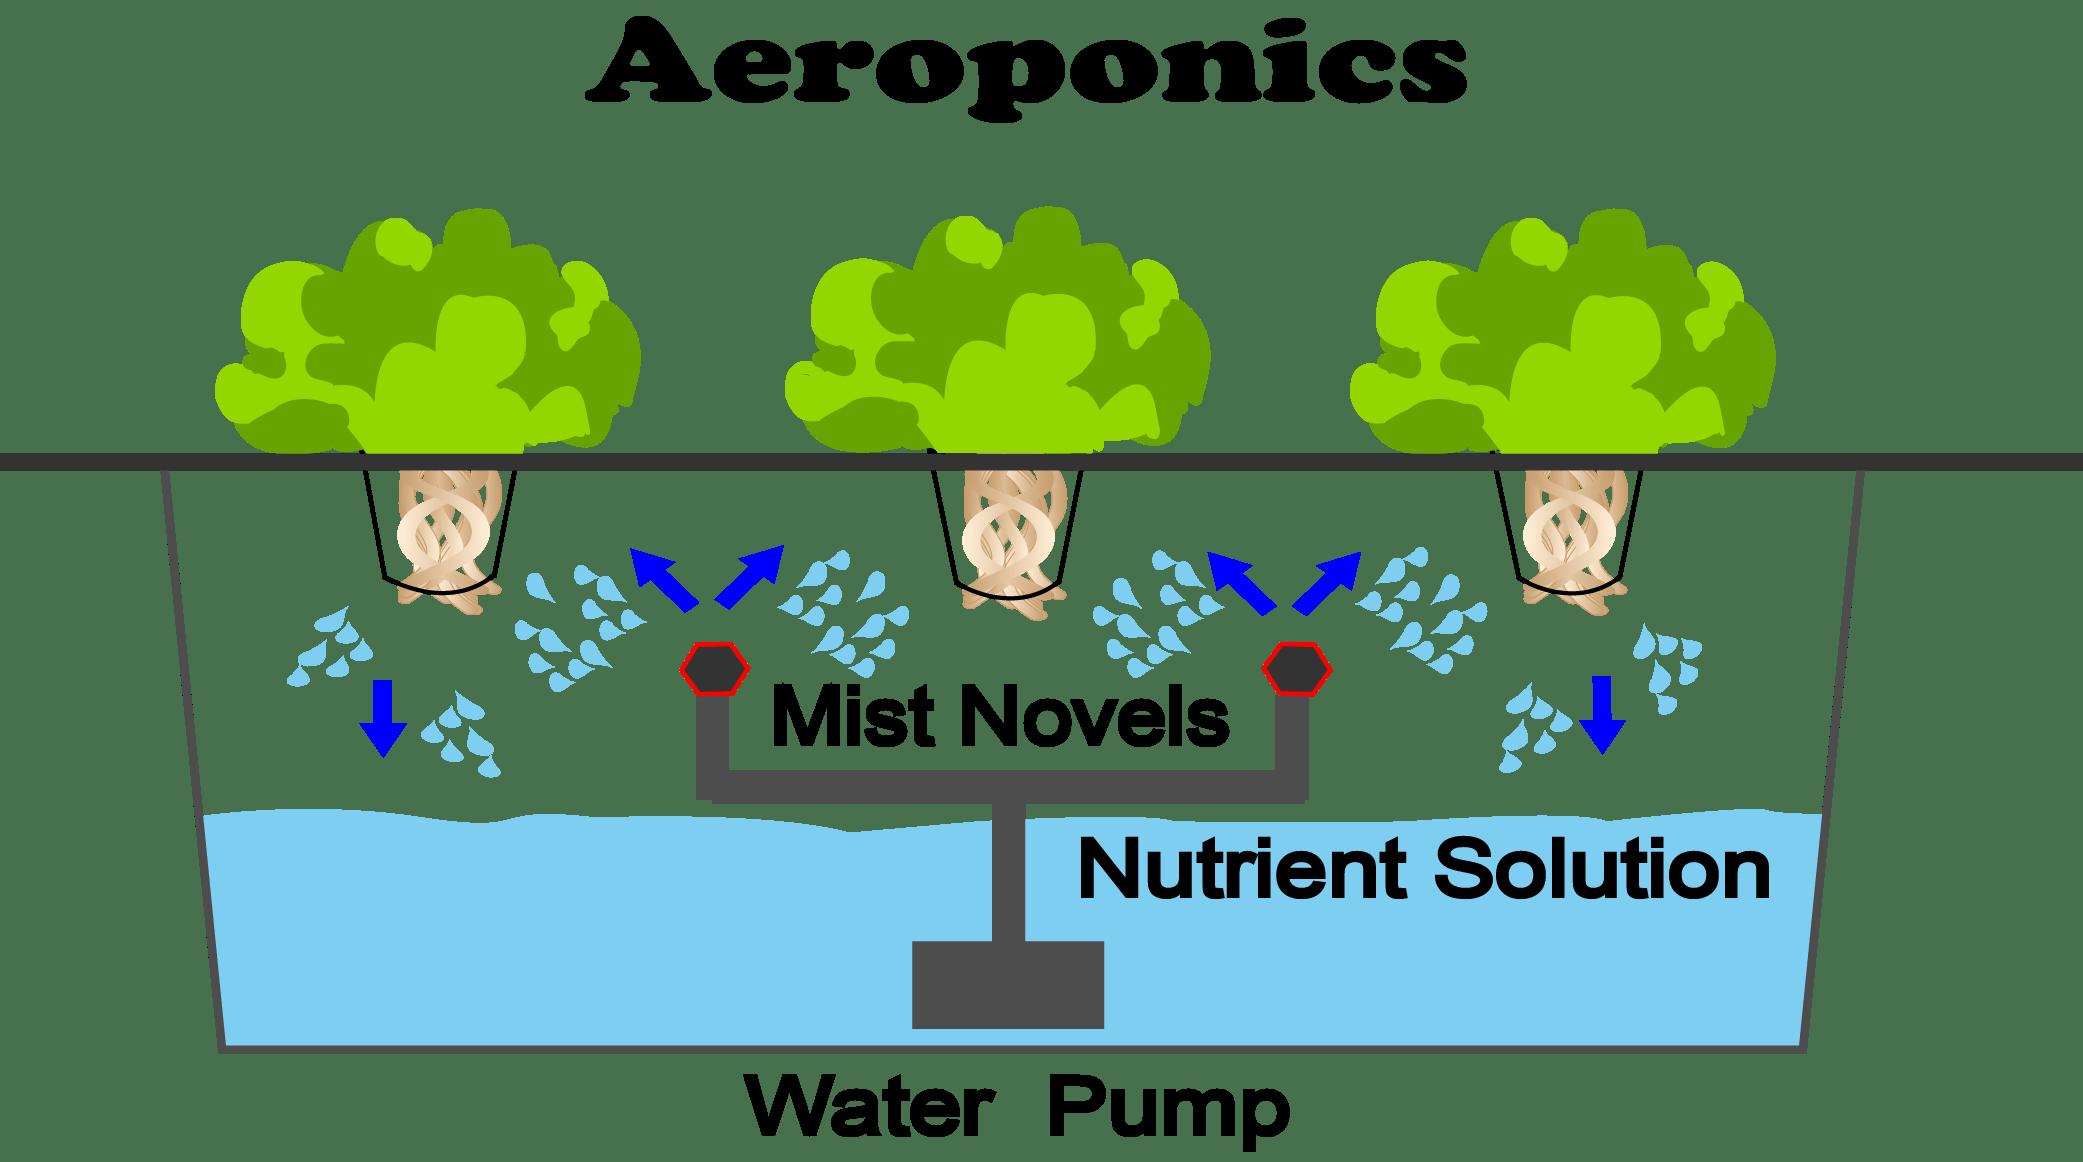 Aeroponics (Hydroponic System)